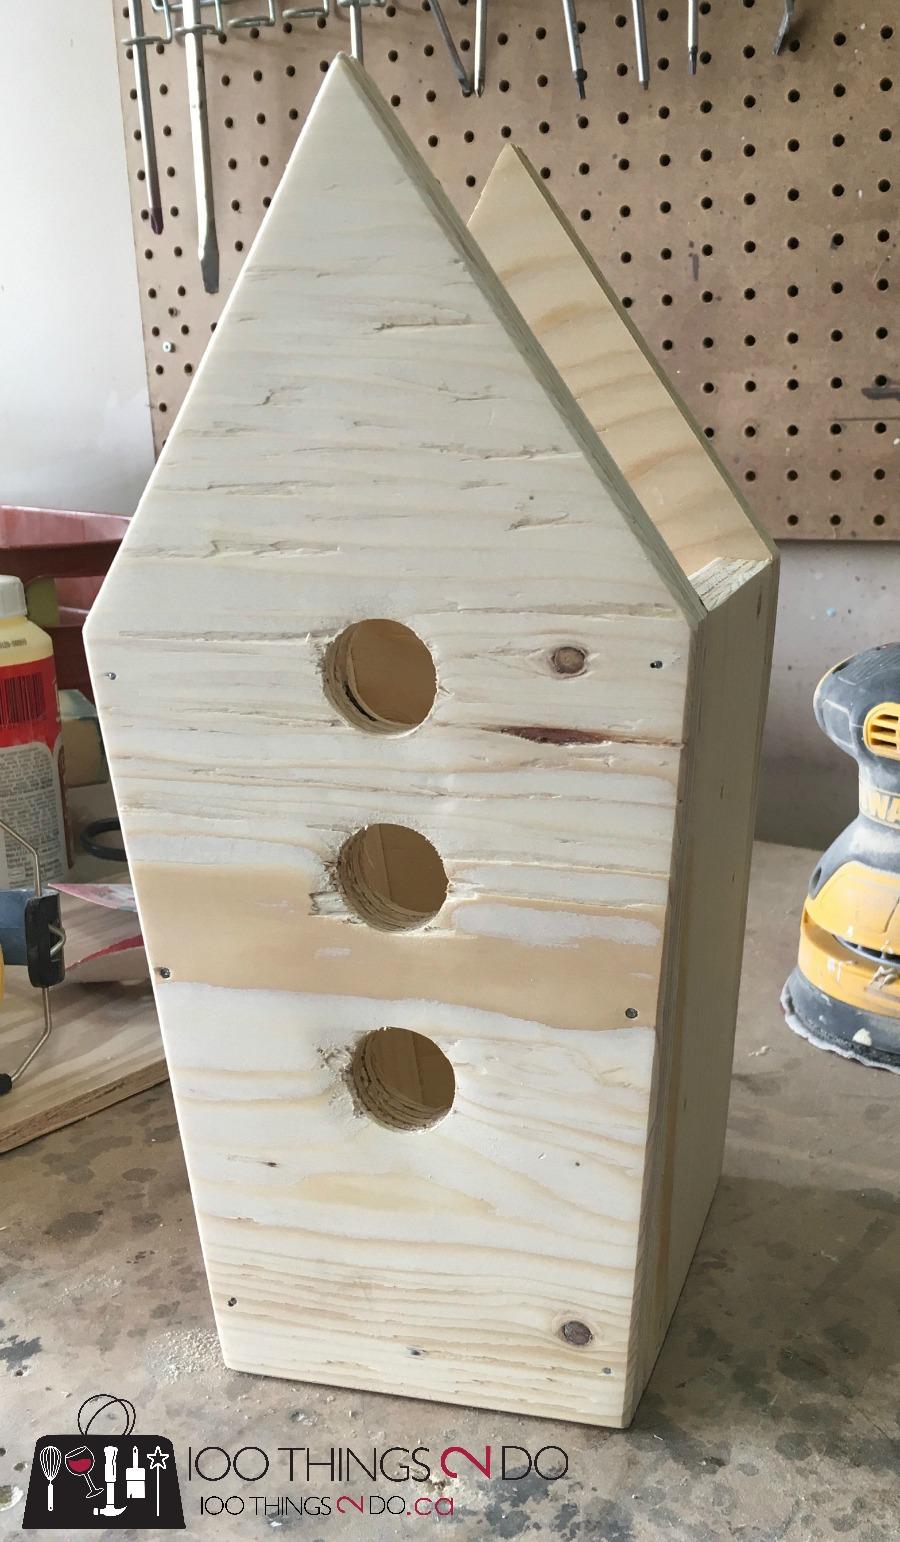 Birdhouse display, birdhouse decor, birdhouses on post, front porch decor, Spring front porch, National DIY Day, Craftbox Girls